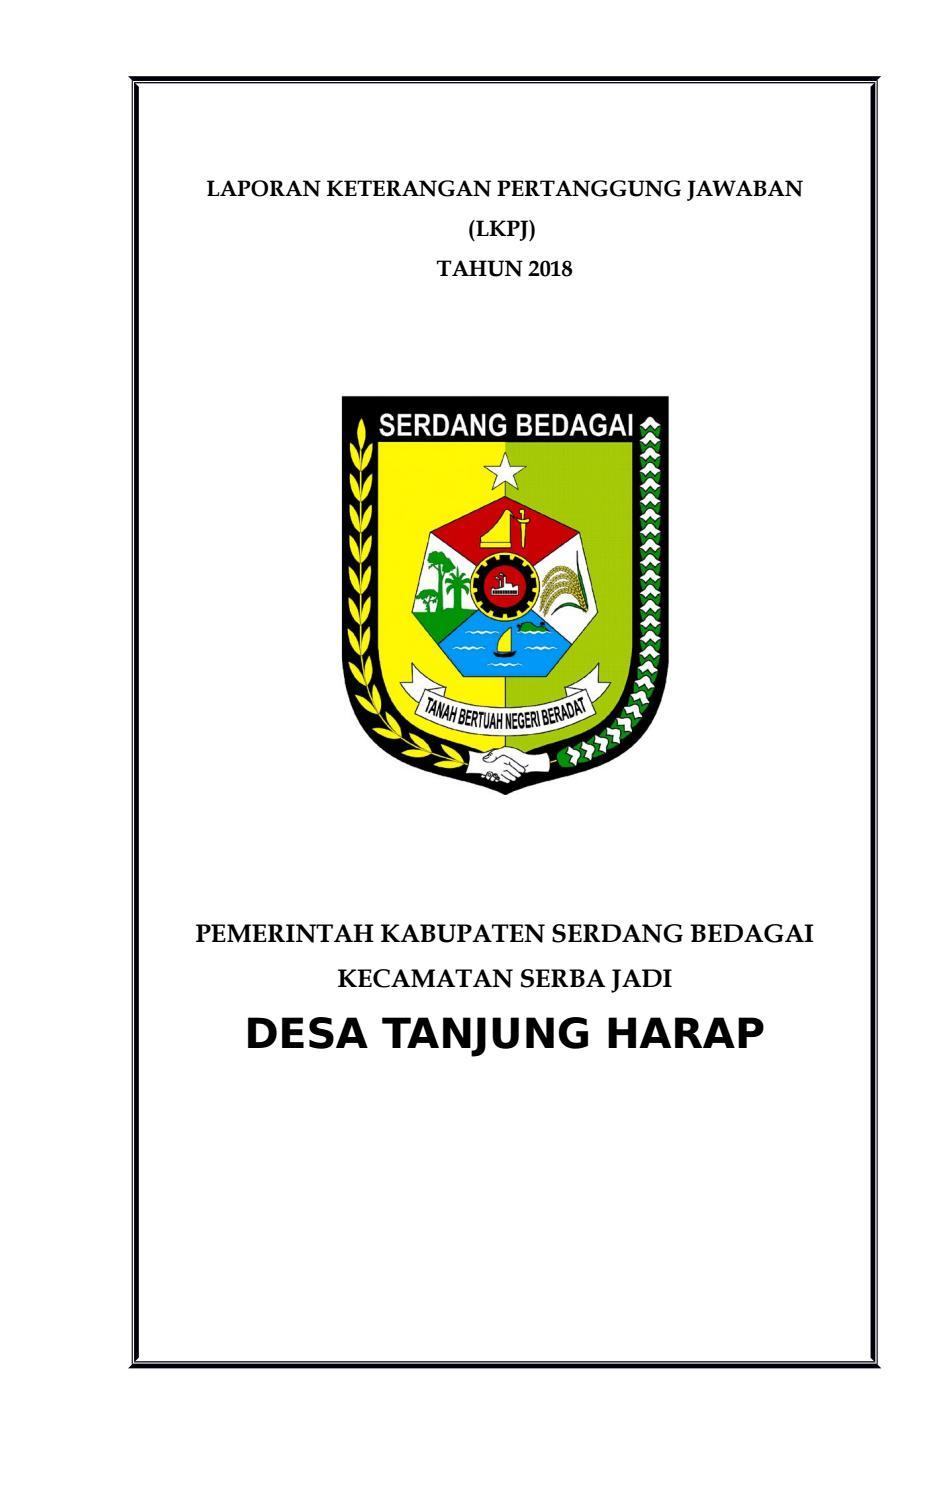 Download Lppd Akhir Masa Jabatan Kepala Desa : download, akhir, jabatan, kepala, Tanjung, Harap, Issuu